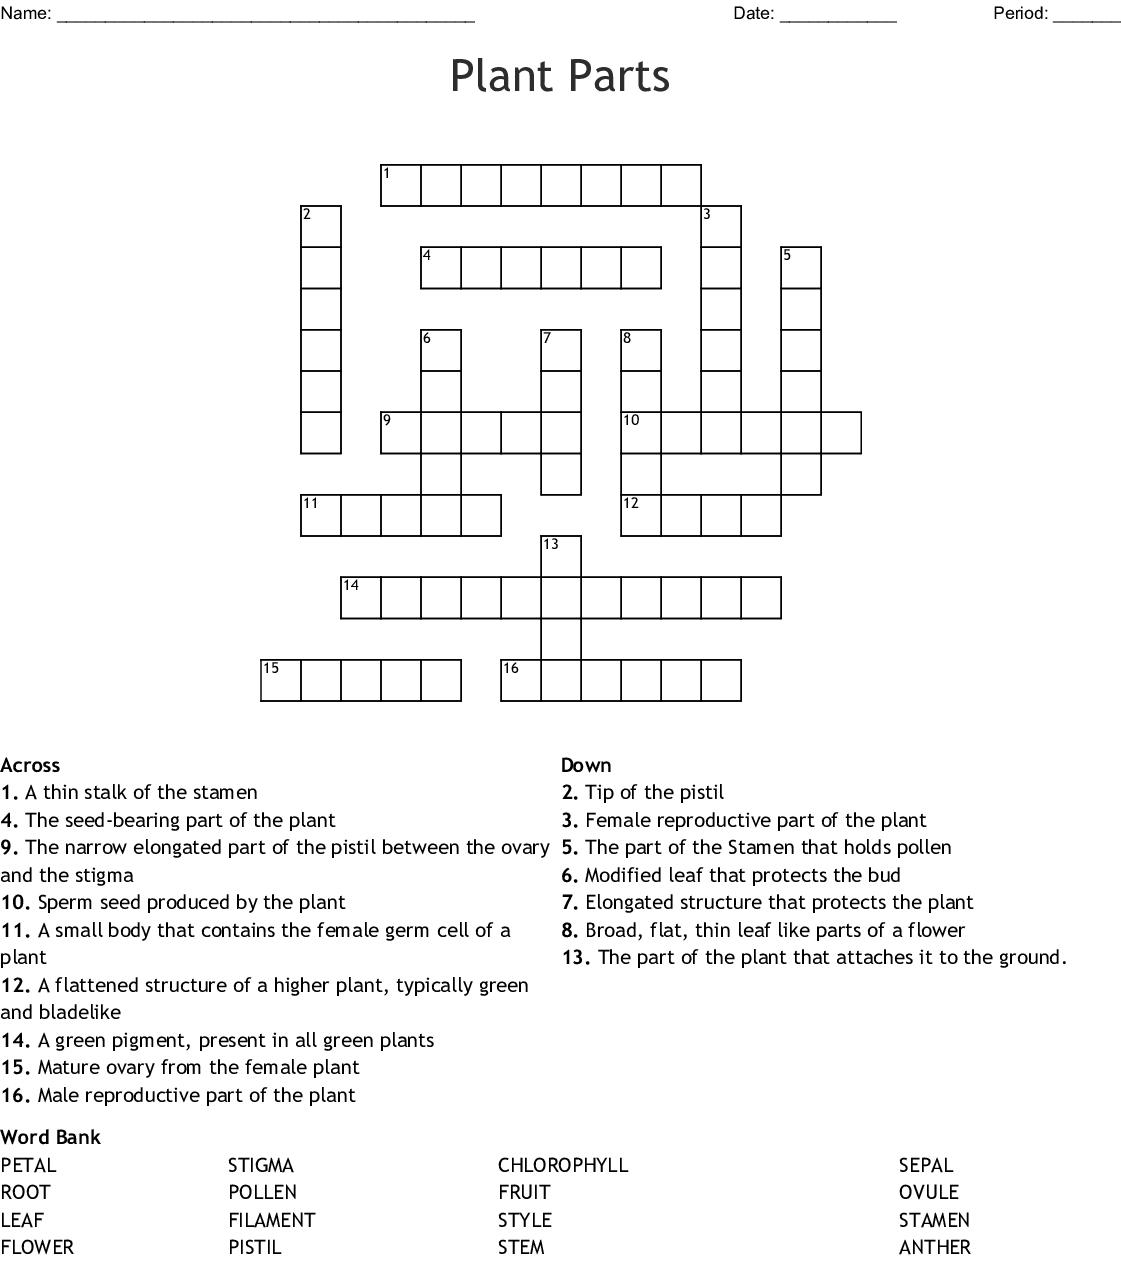 Leaf Anatomy Worksheet Colored Answer Key